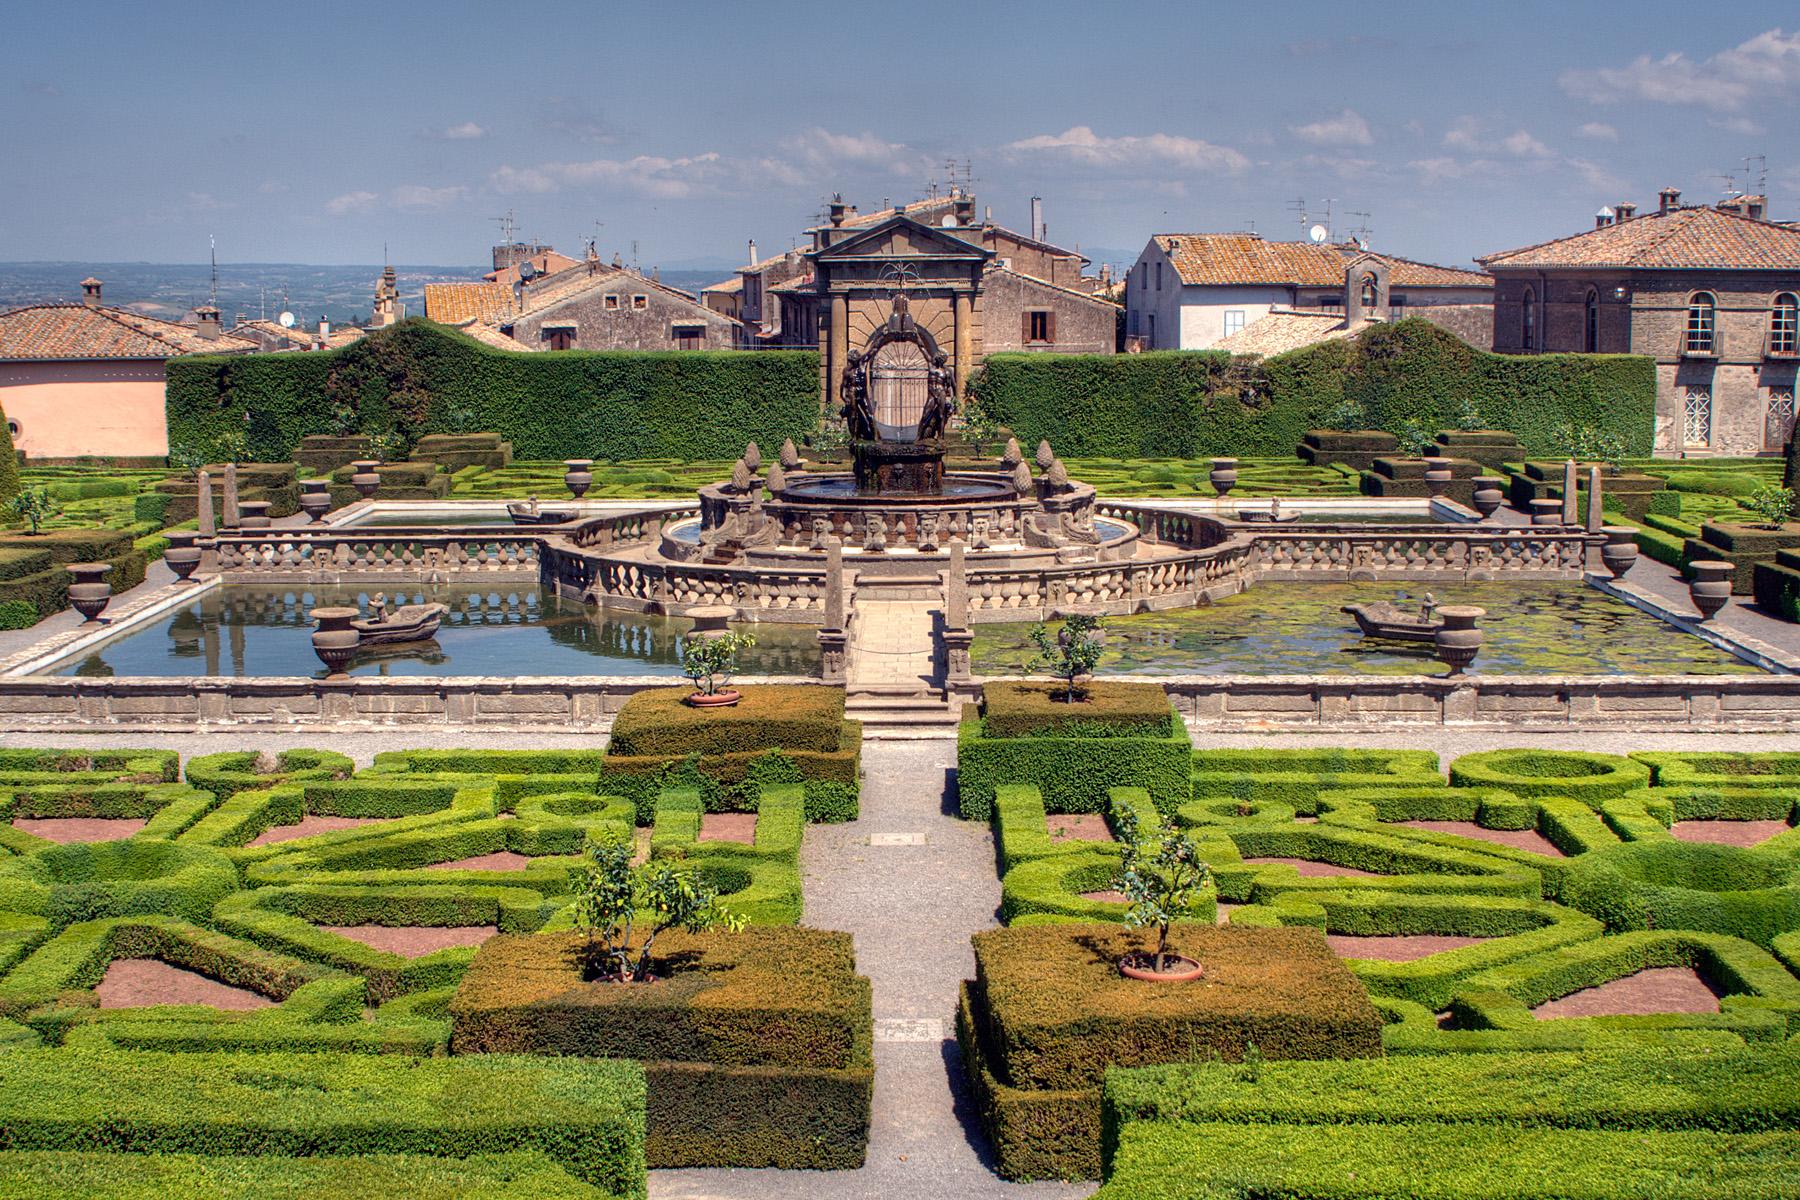 Villa Lante Jardins.jpg